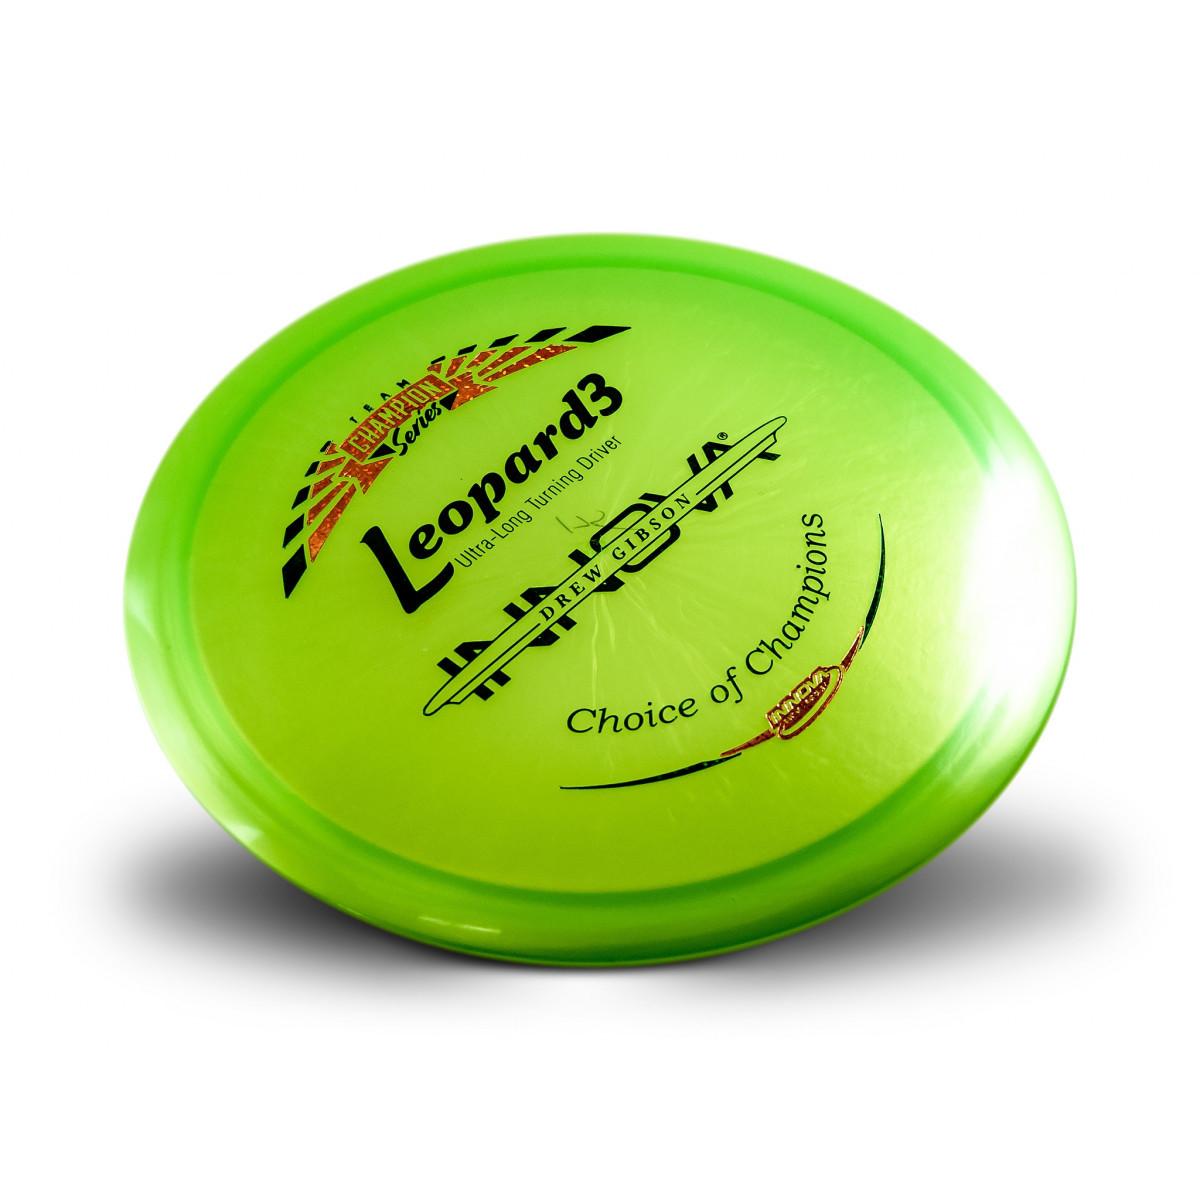 Innova Luster Champion Leopard3 Drew Gibson Tour Series